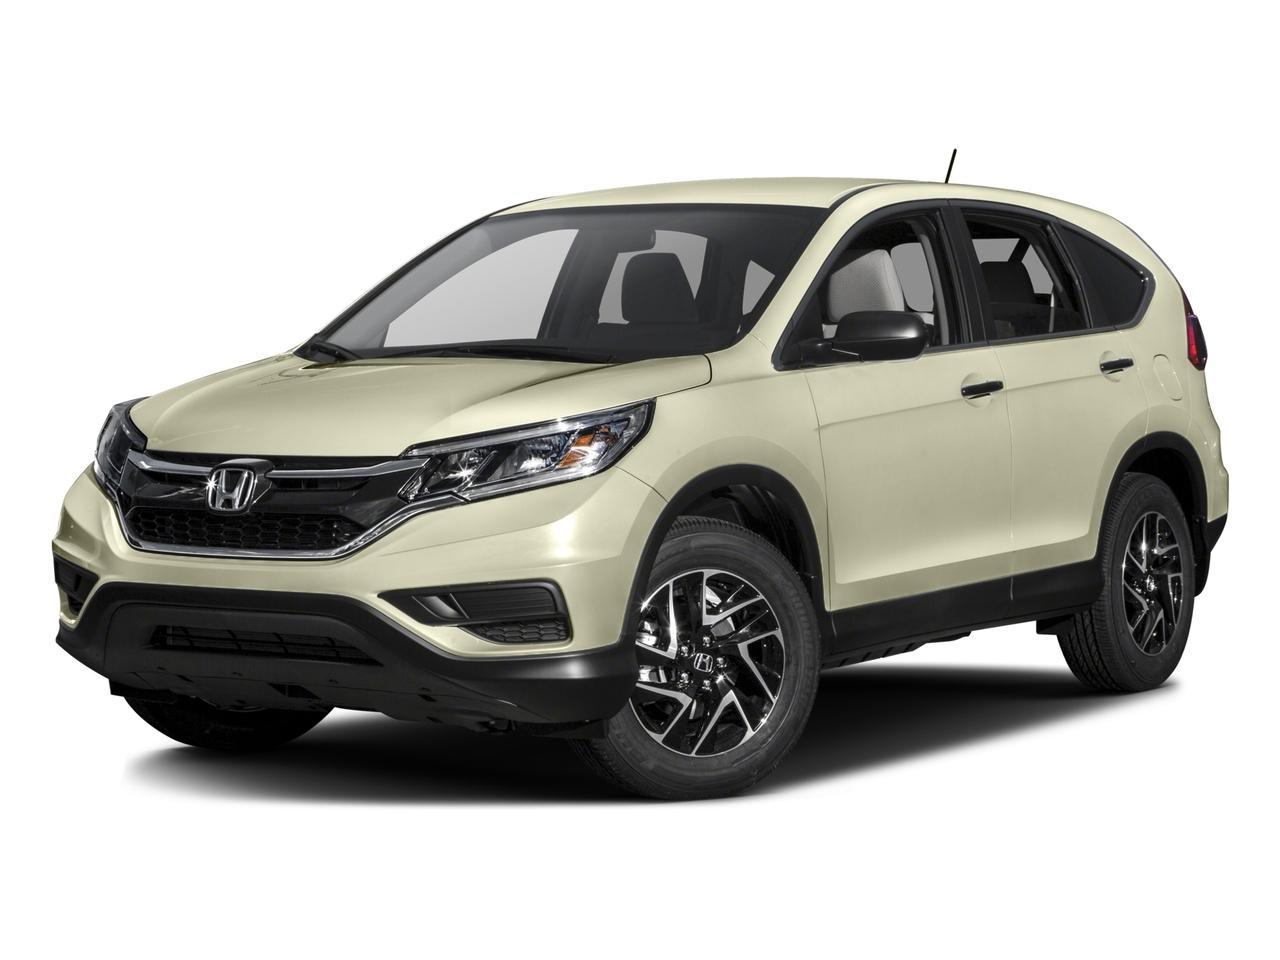 2016 Honda CR-V Vehicle Photo in Pittsburg, CA 94565